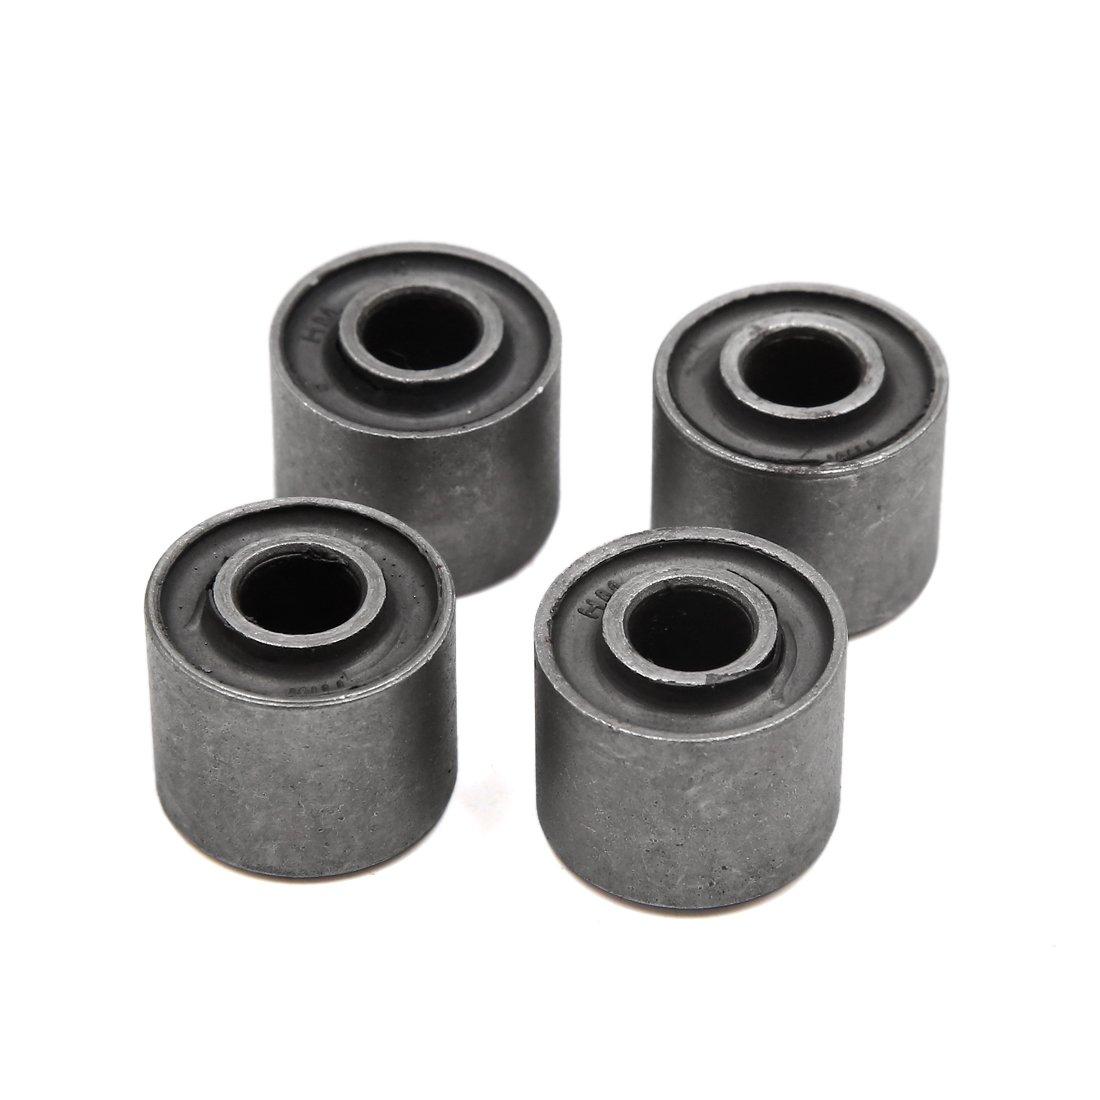 uxcell 4Pcs 10mm Inner Dia Metal Rear Wheel Damper Bush Bushing for WY125